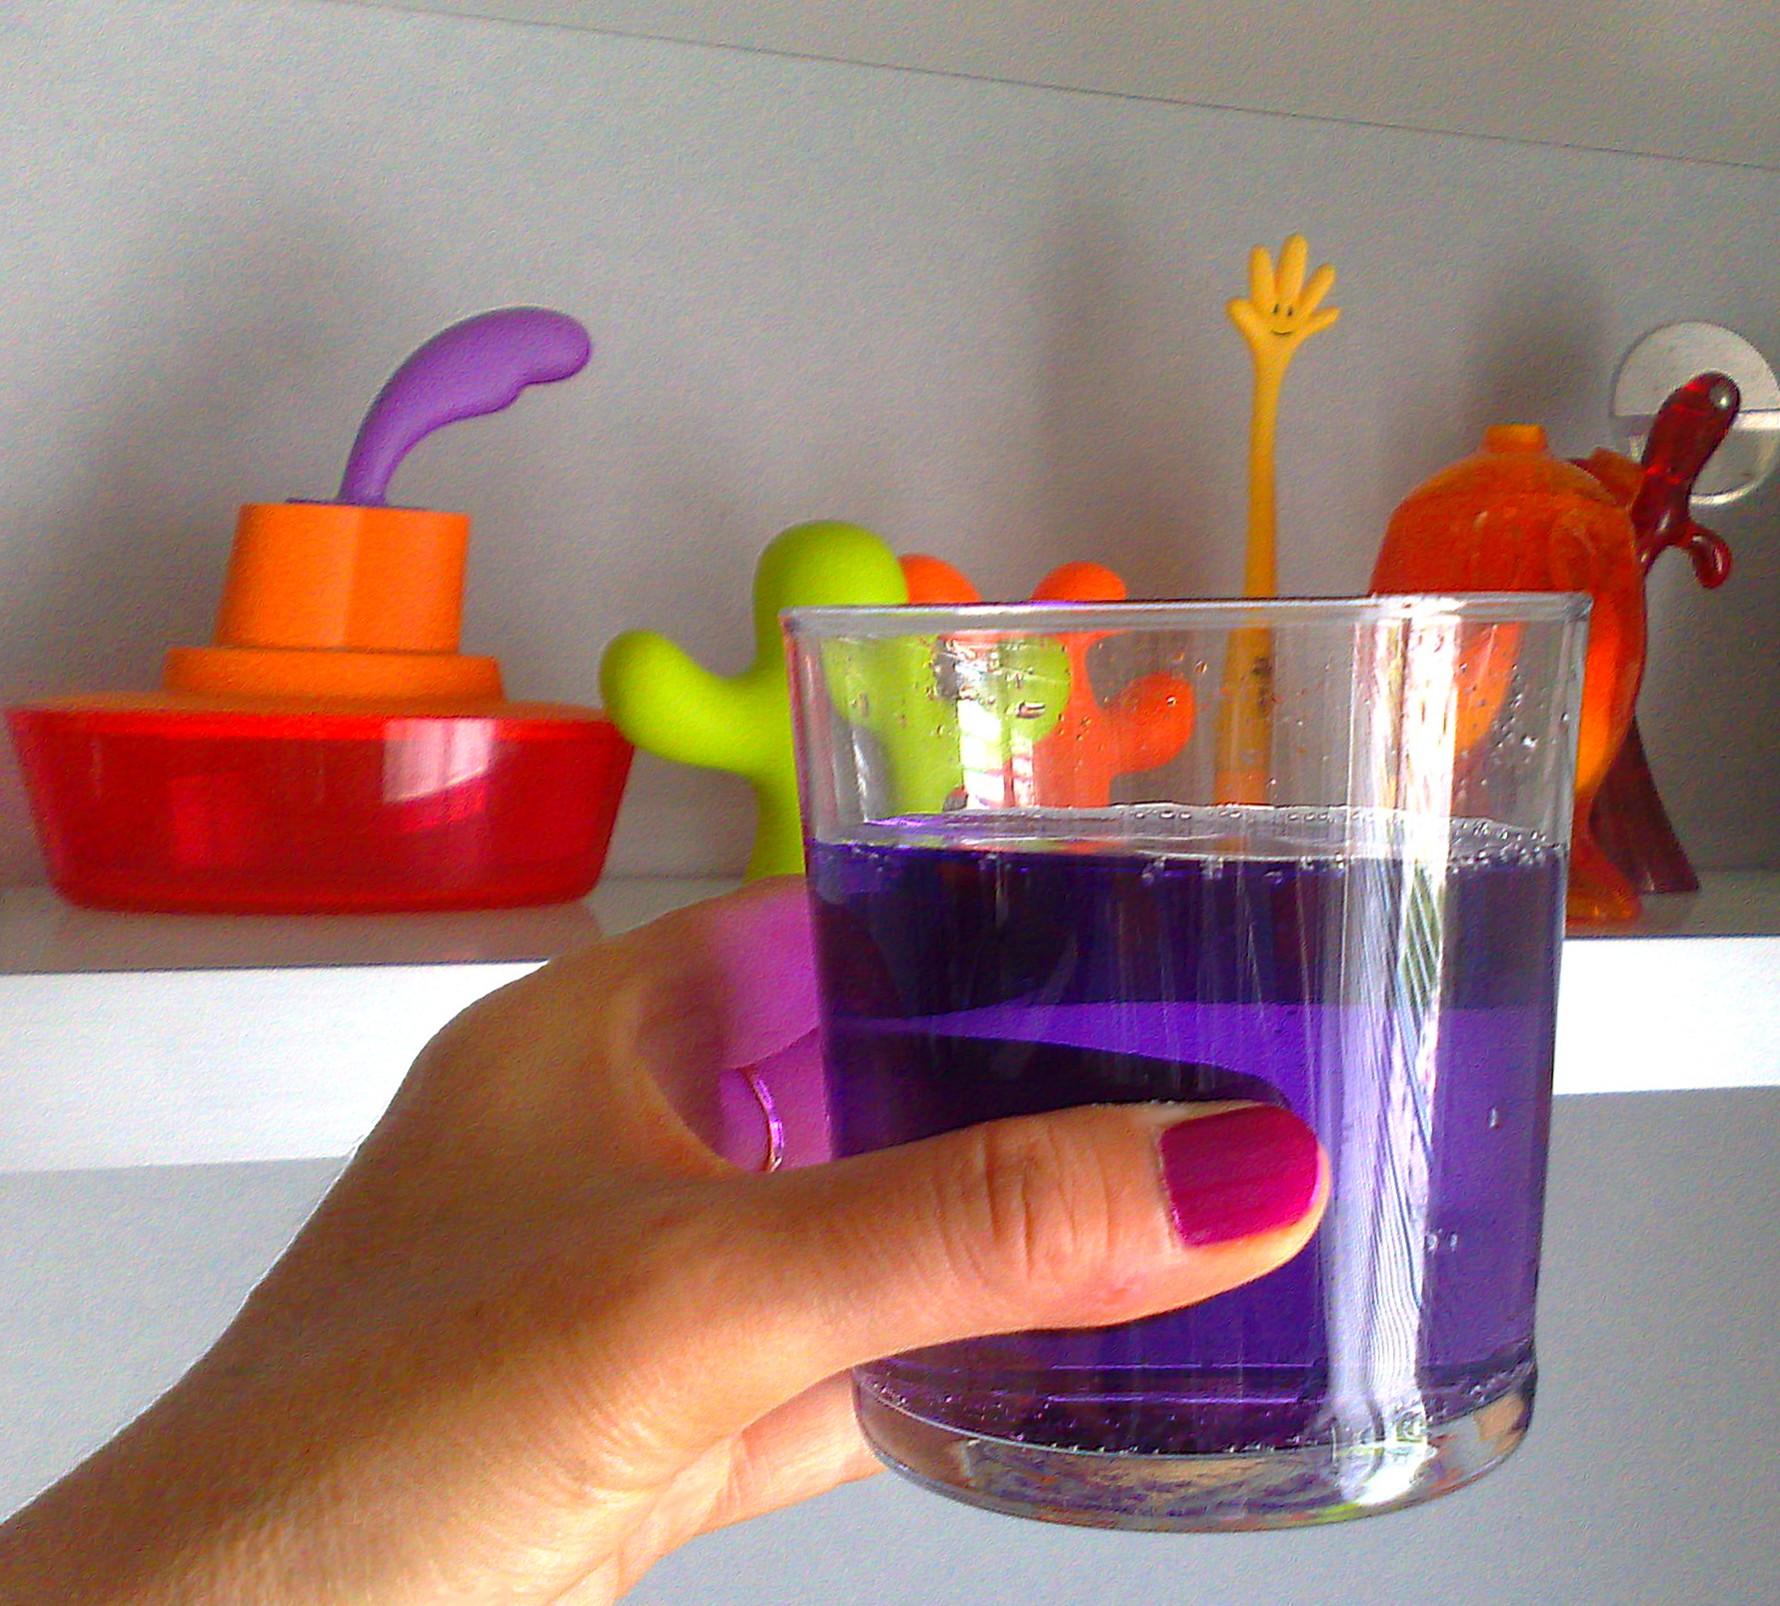 Sirop de concombre lavieenrouge - Sirop de violette ...